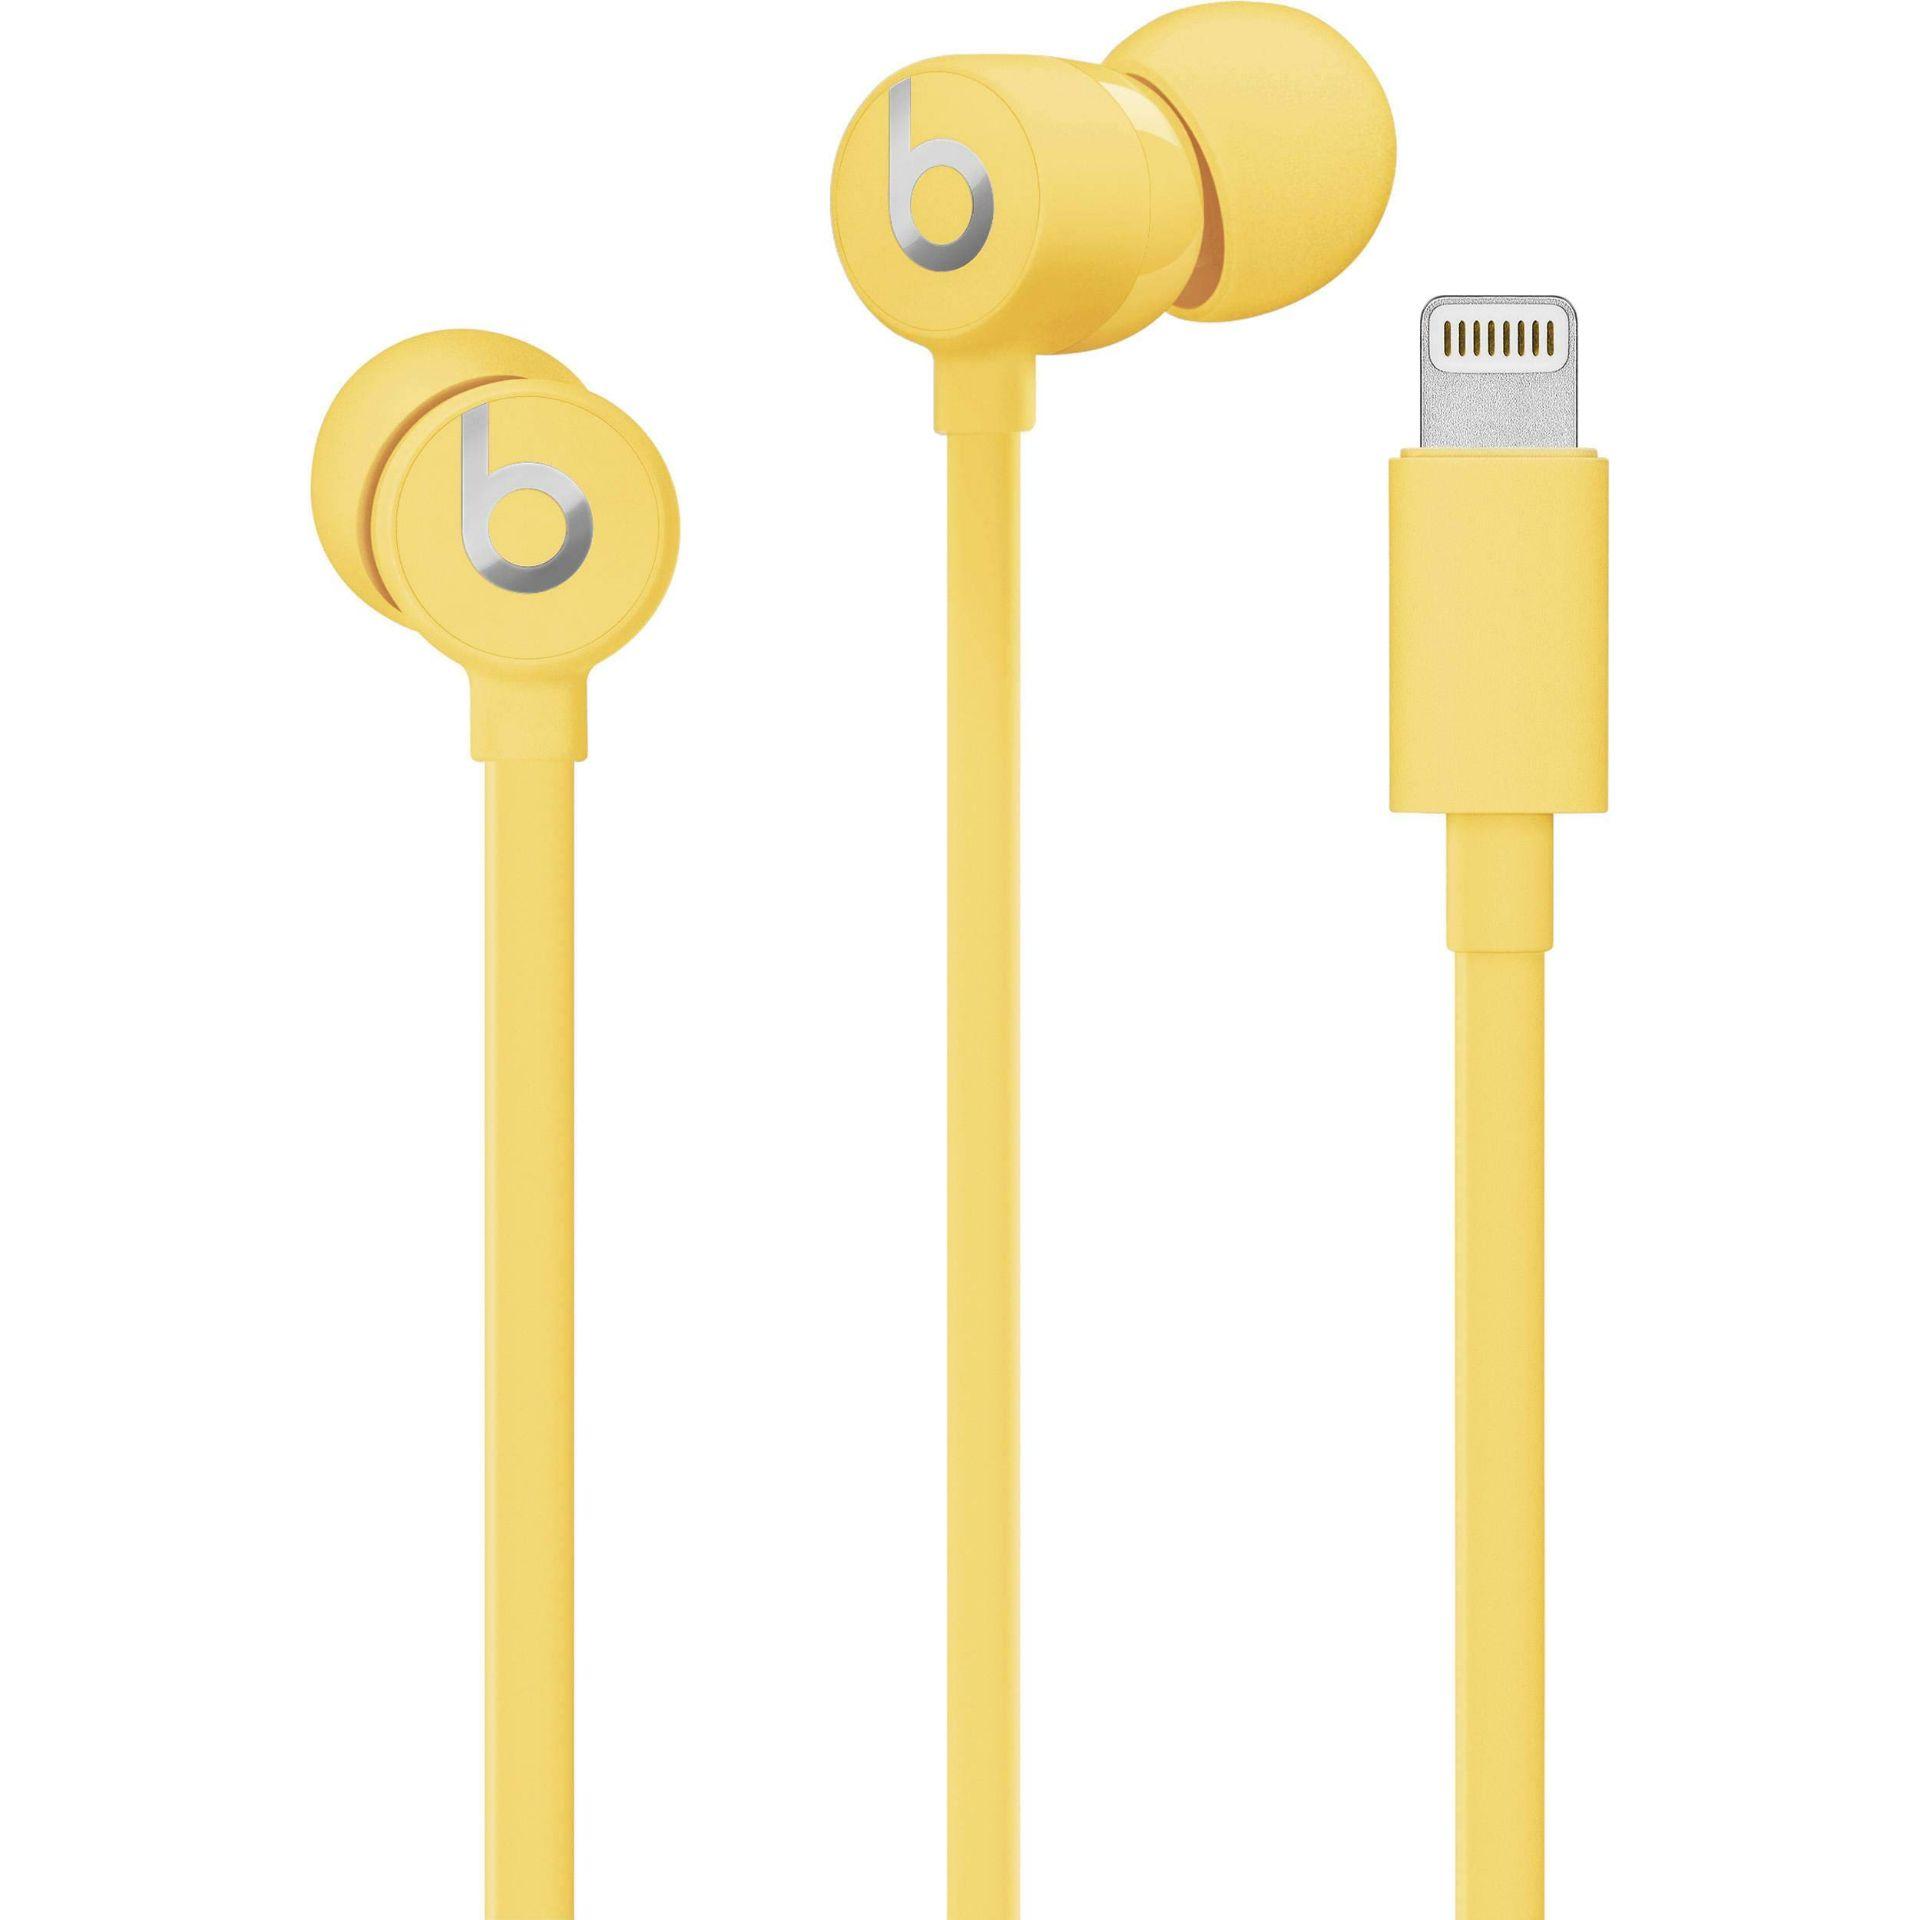 + VAT Brand New UrBeats 3 Earphones With Lightning Connector - Yellow - Ergonomic Design - High